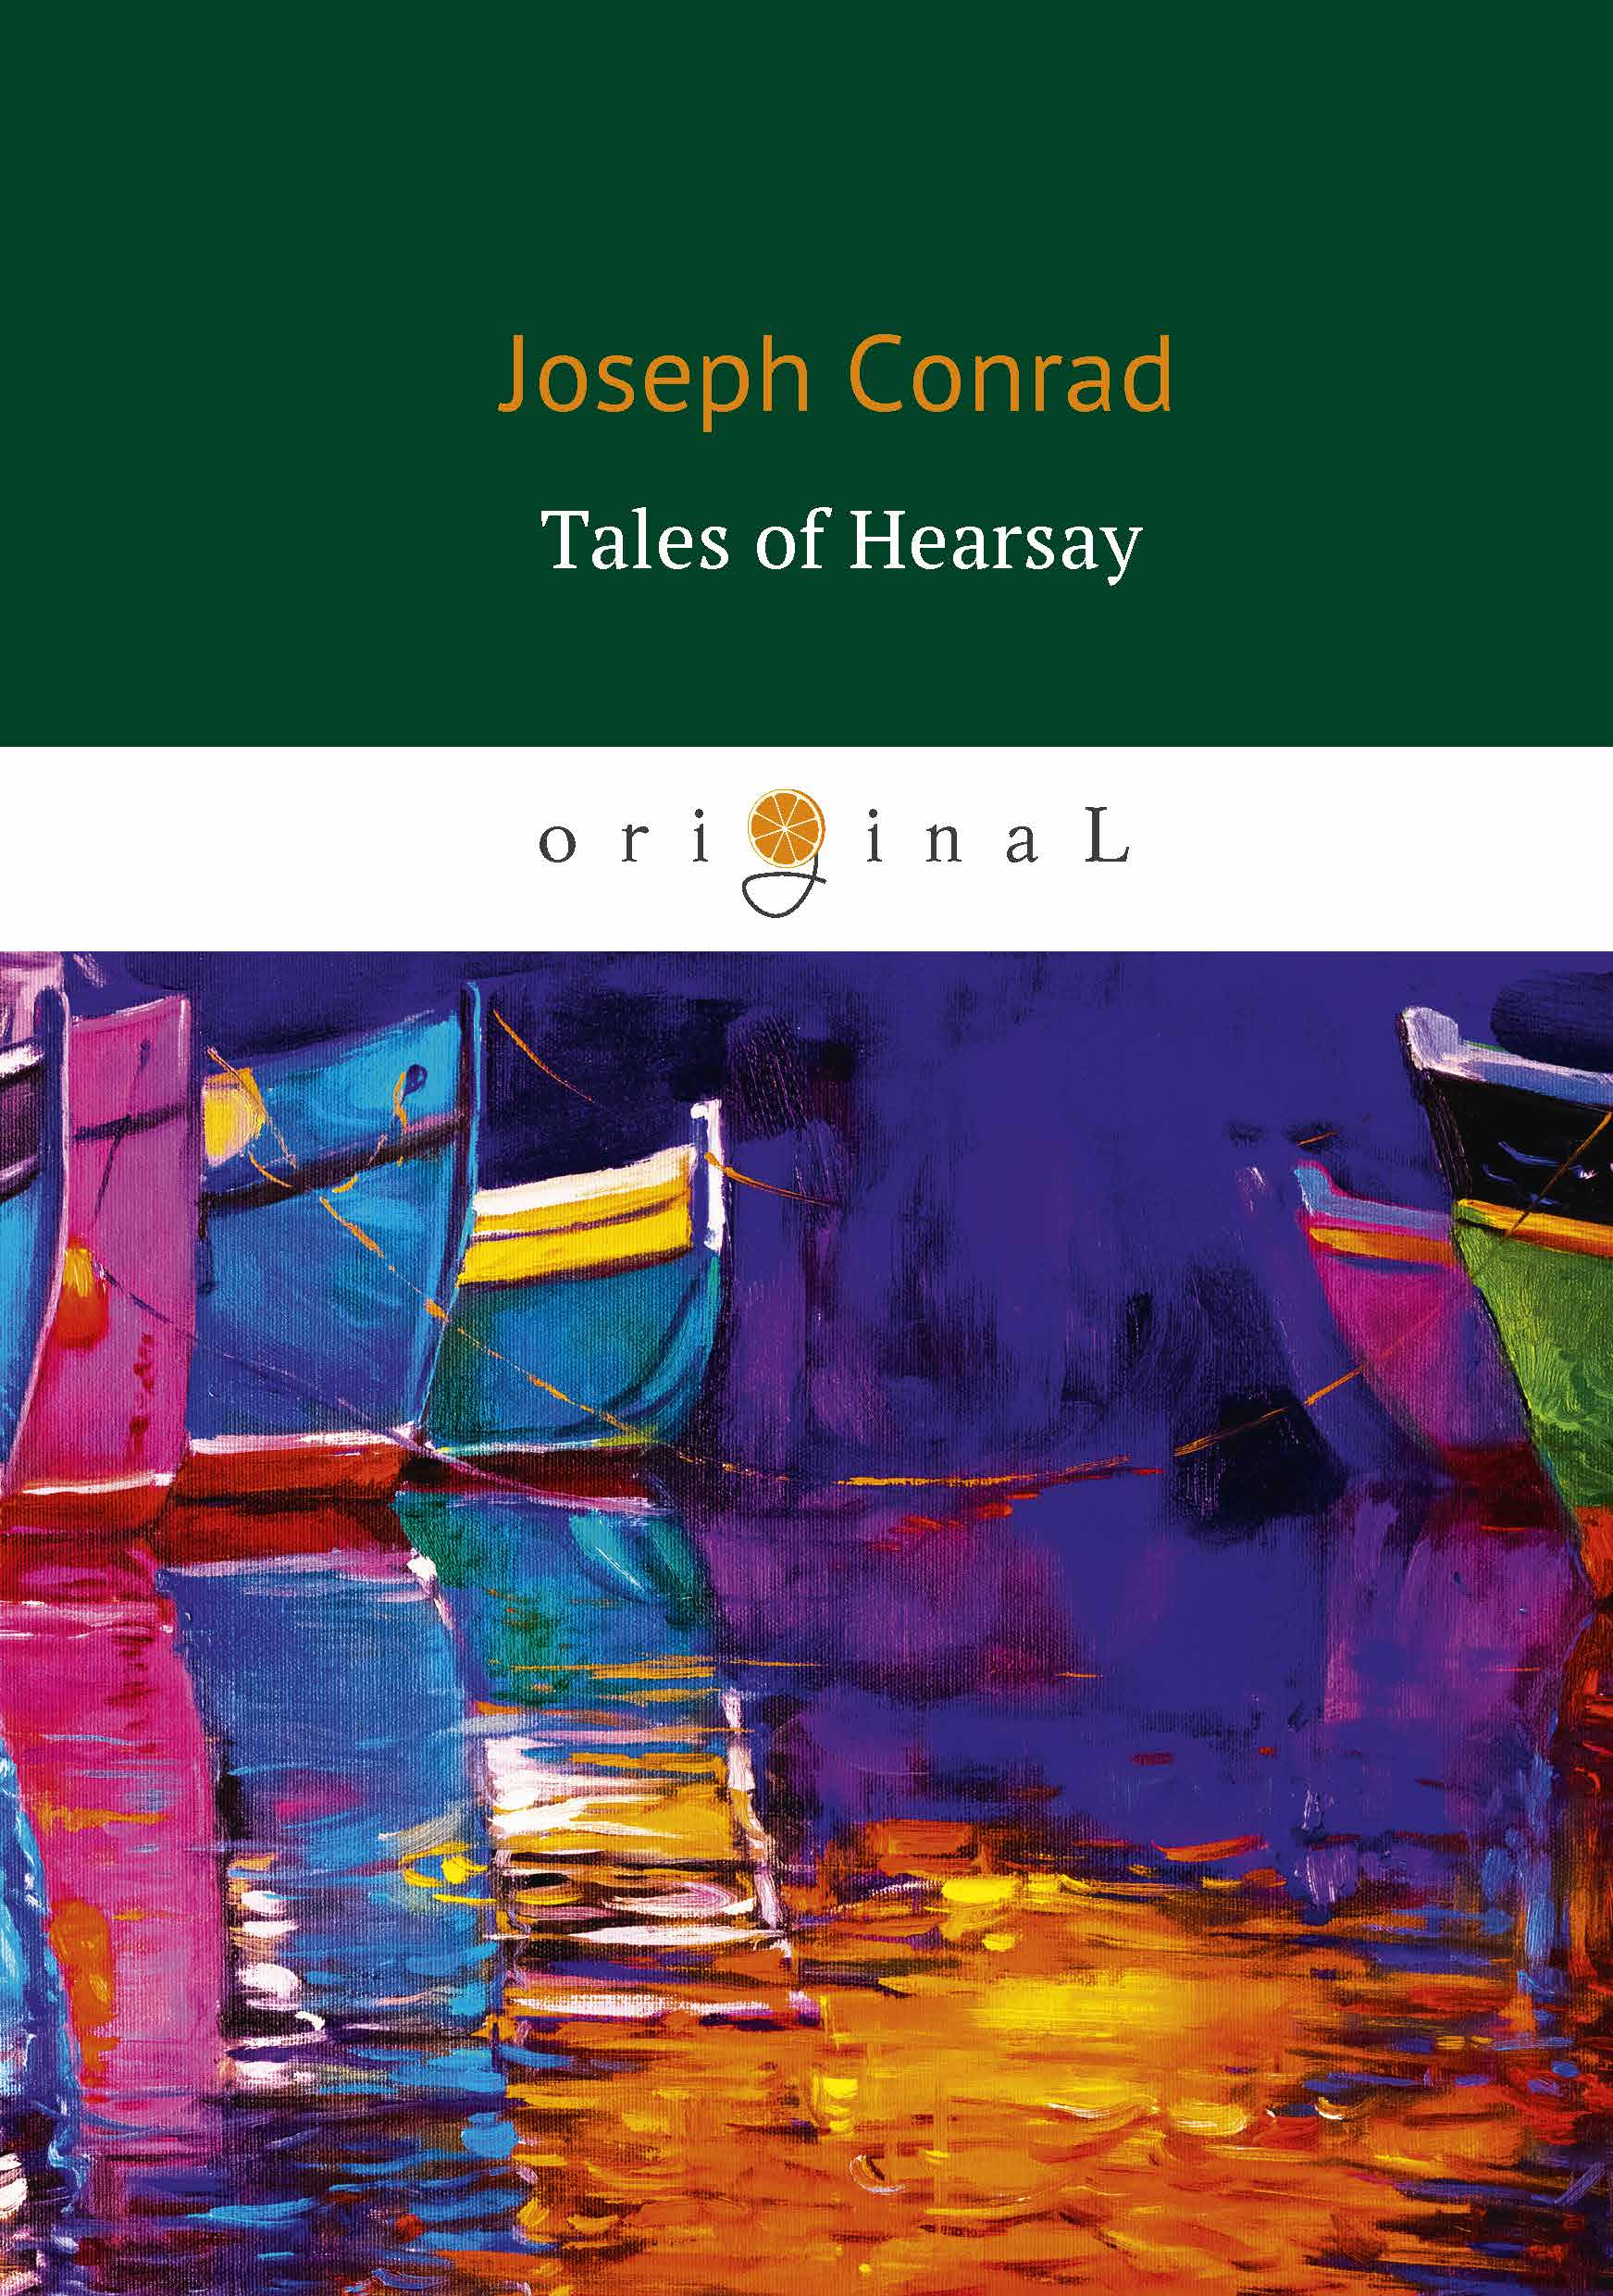 Joseph Conrad Tales of Hearsay (Сборник: Чёрный штурман, Князь Римский, Душа воина, История) conrad j tales of hearsay